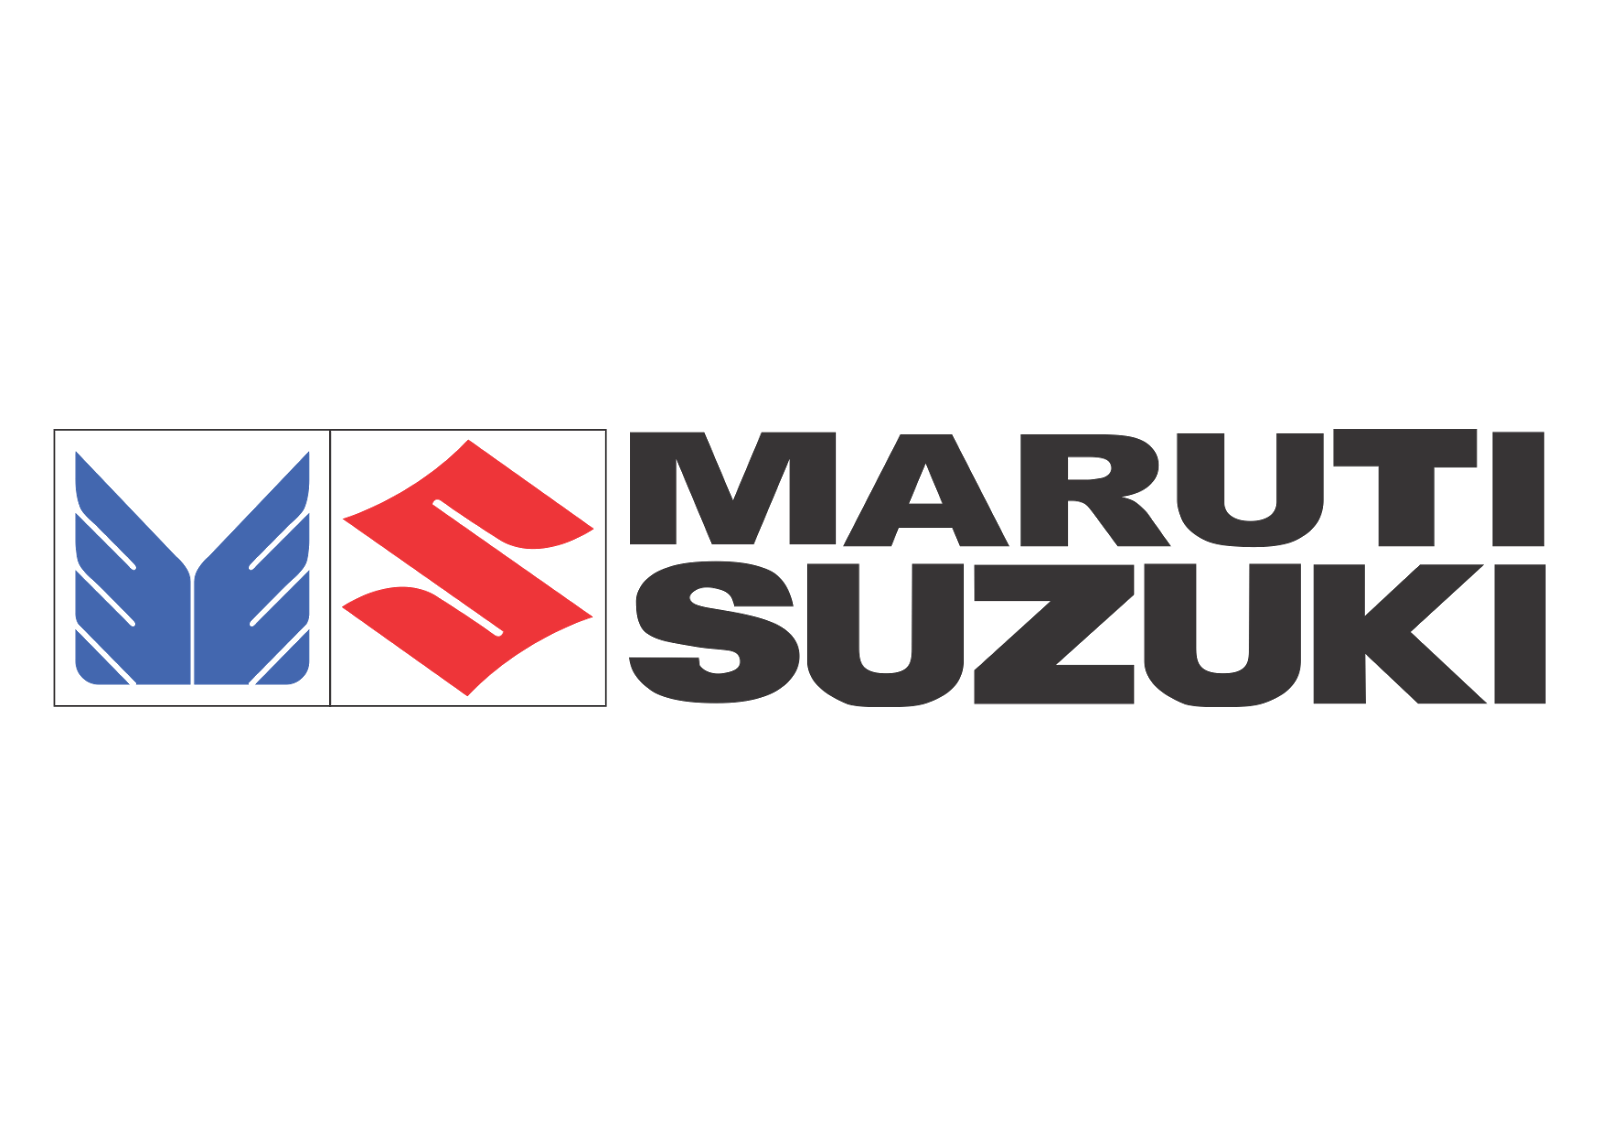 maruti suzuki logo vector format cdr ai eps svg pdf png